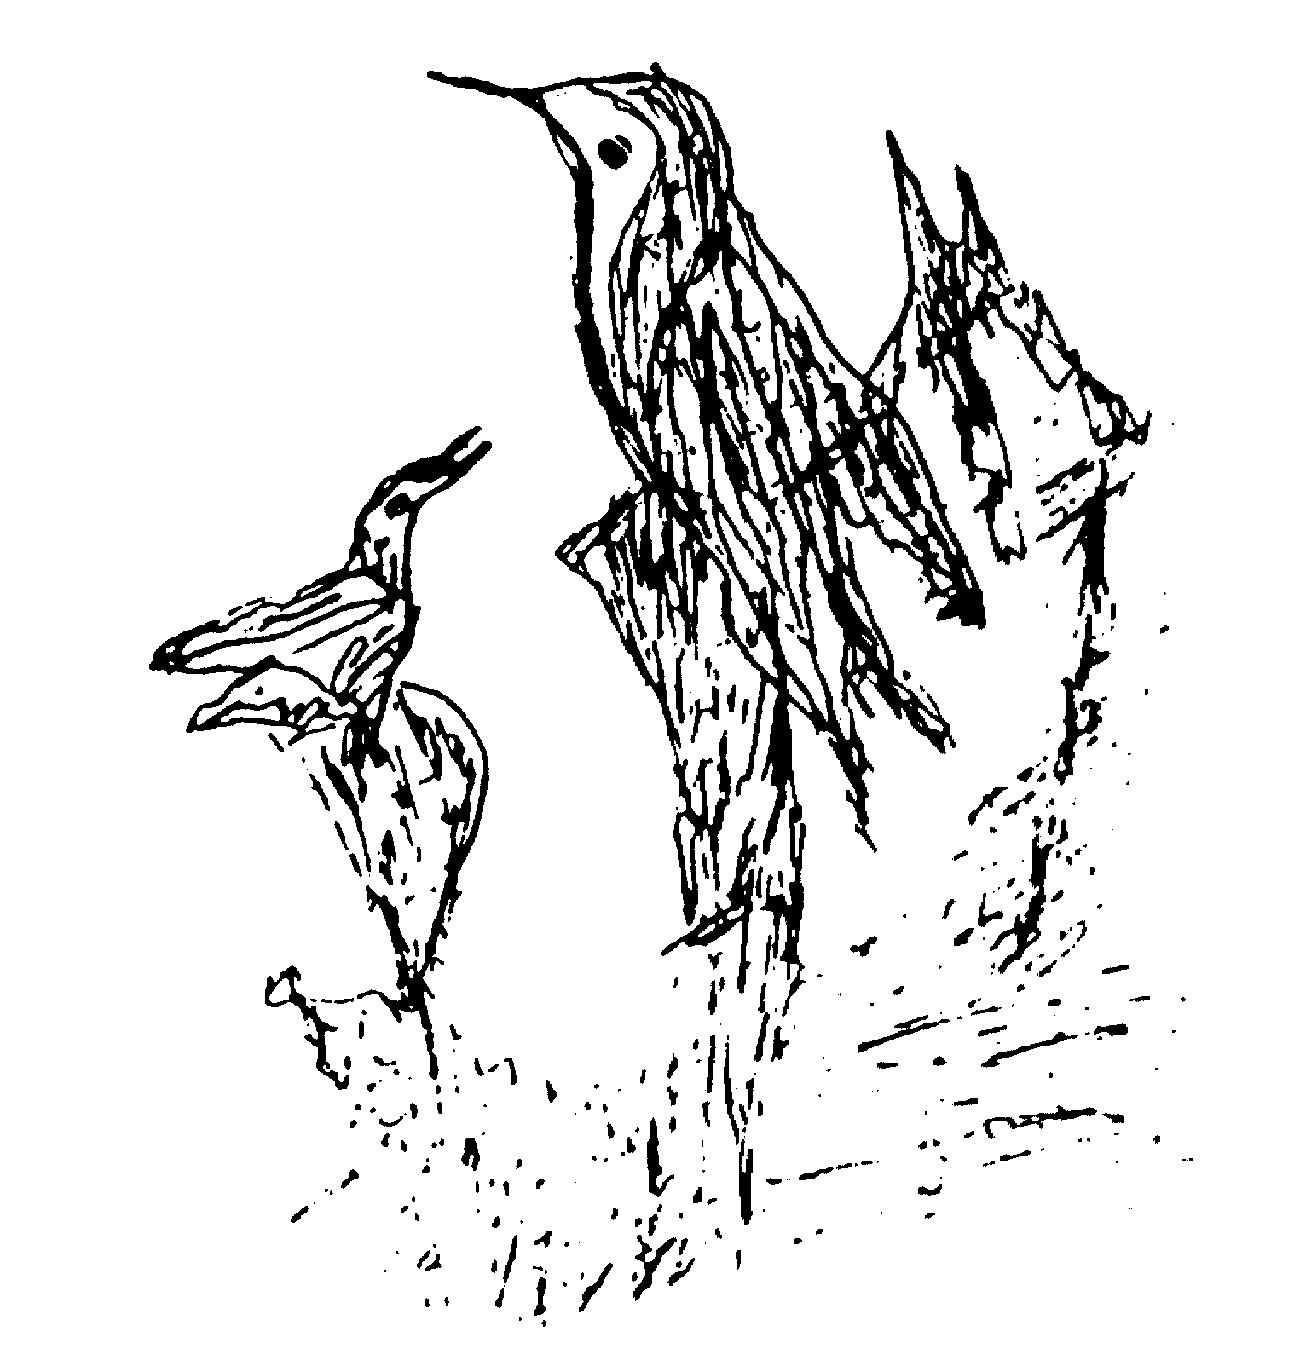 142-birds-ckg